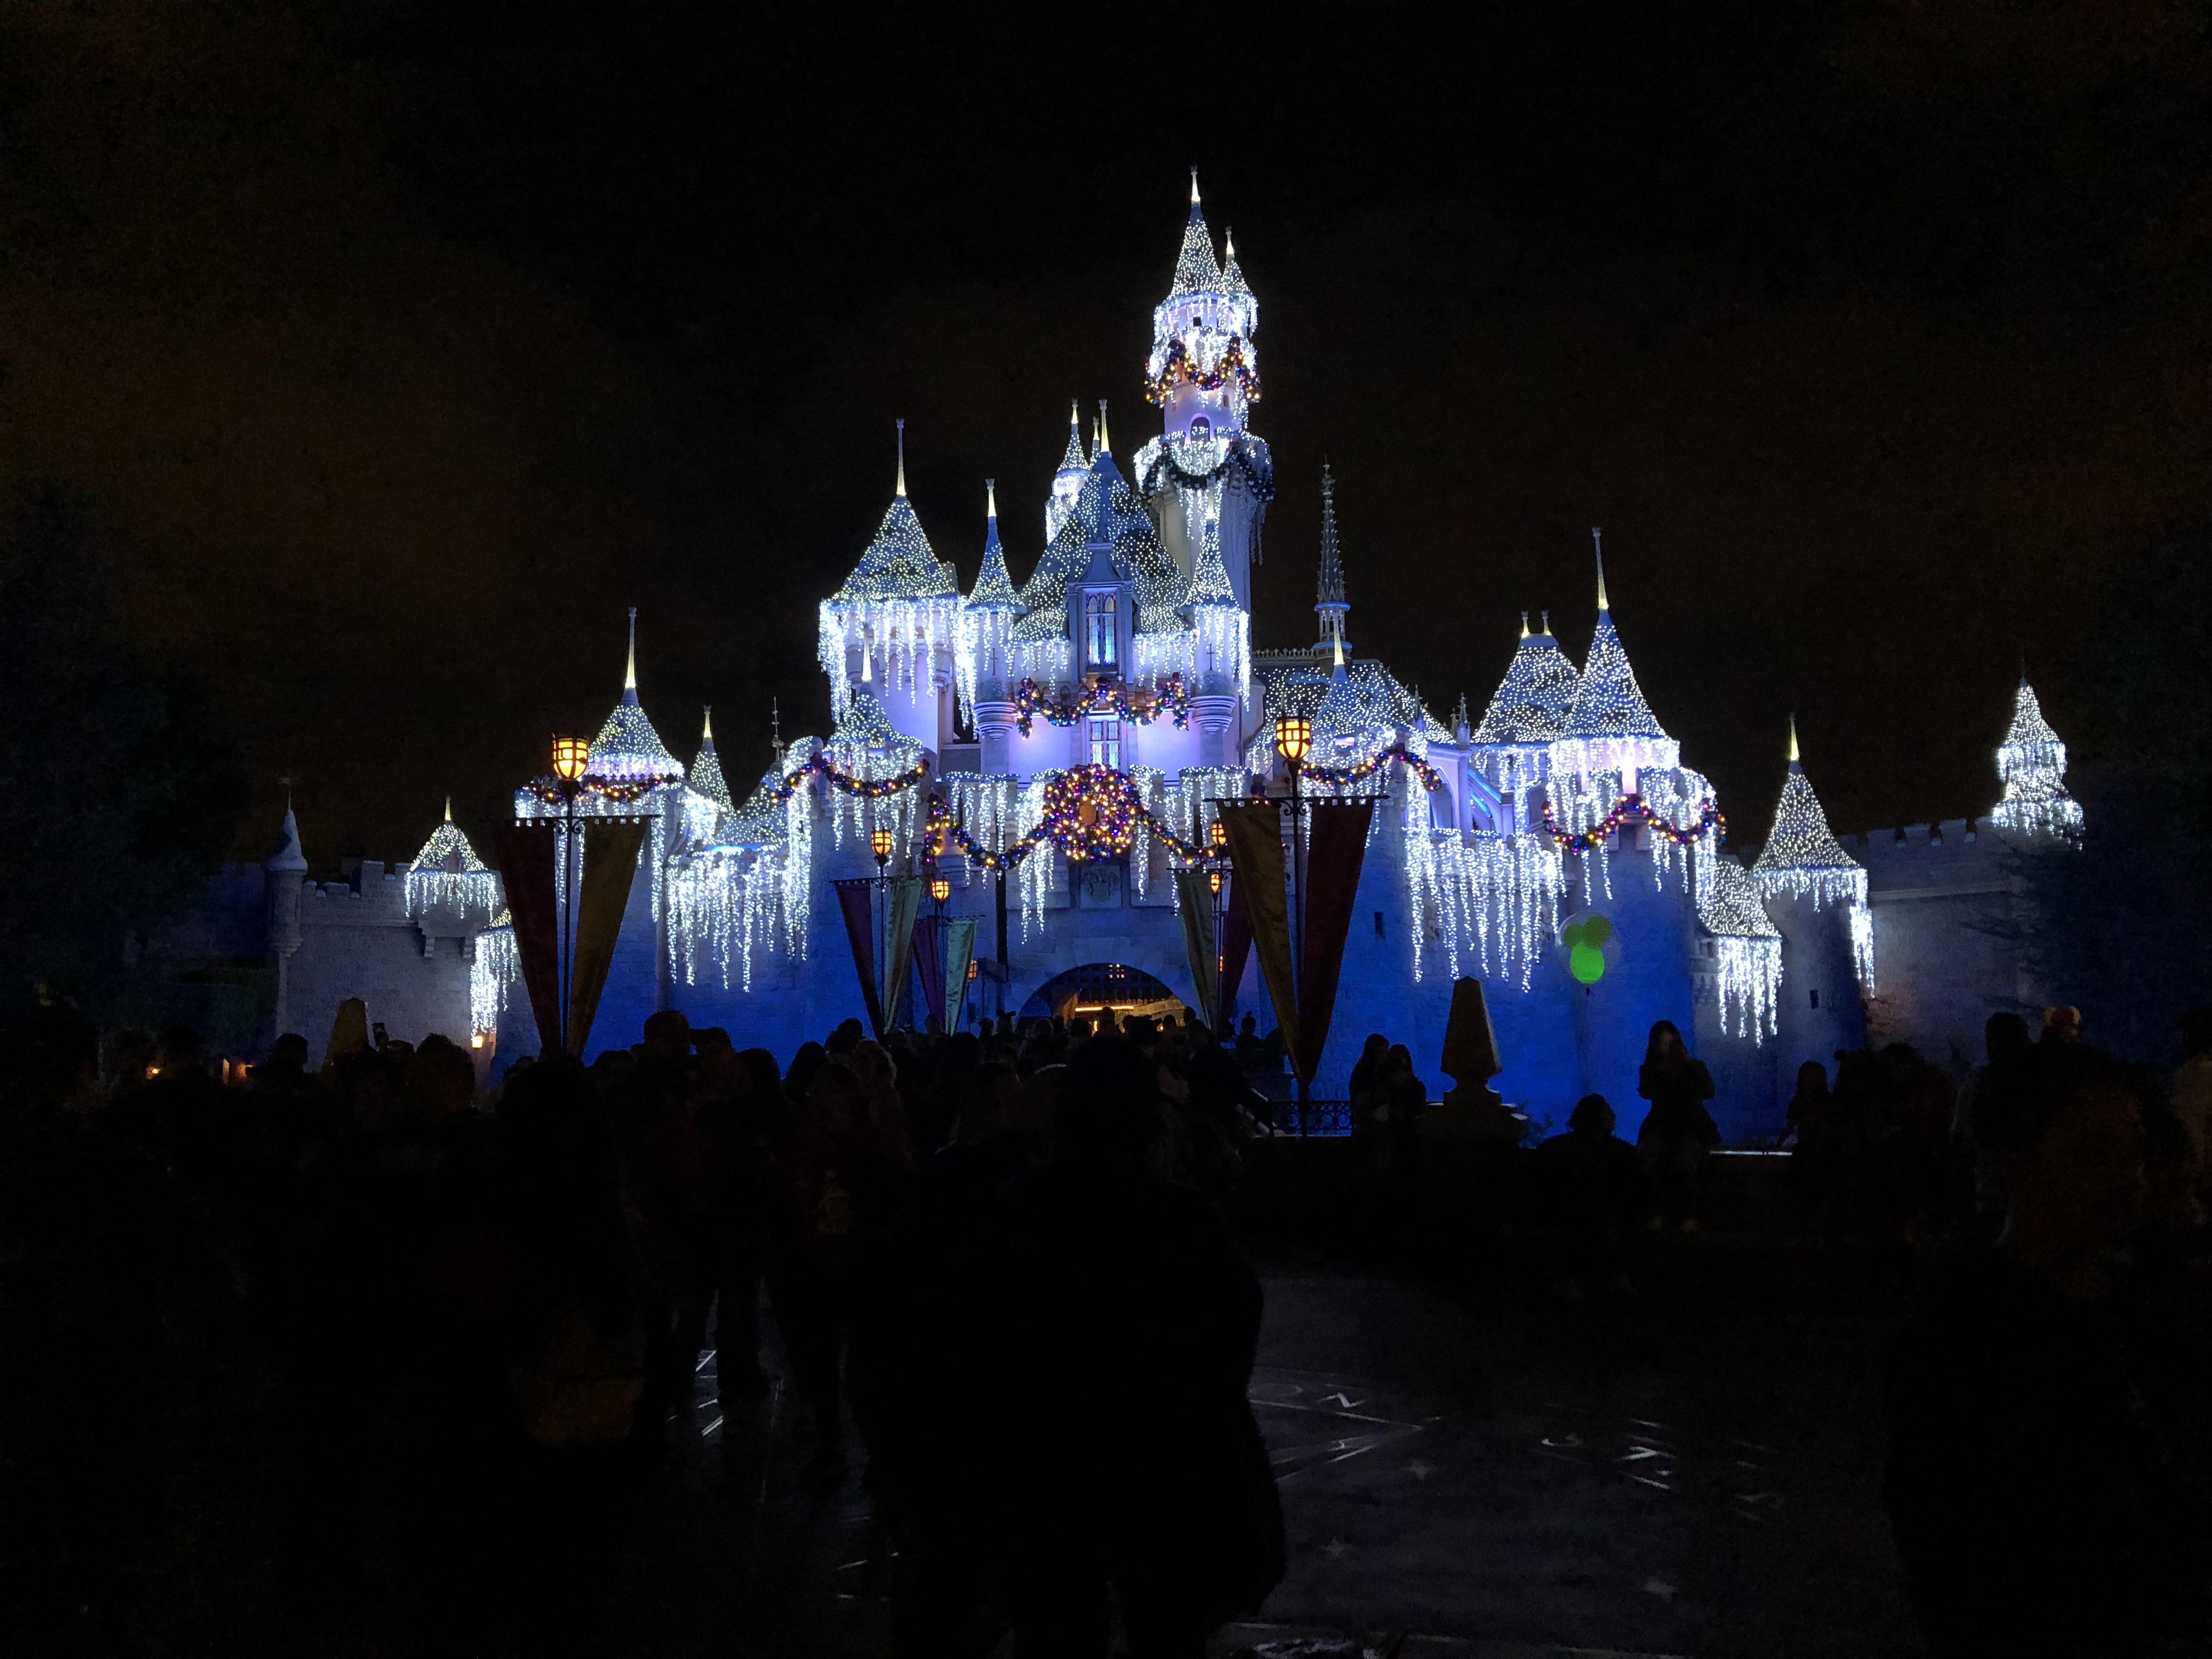 Christmas at Disneyland Castle